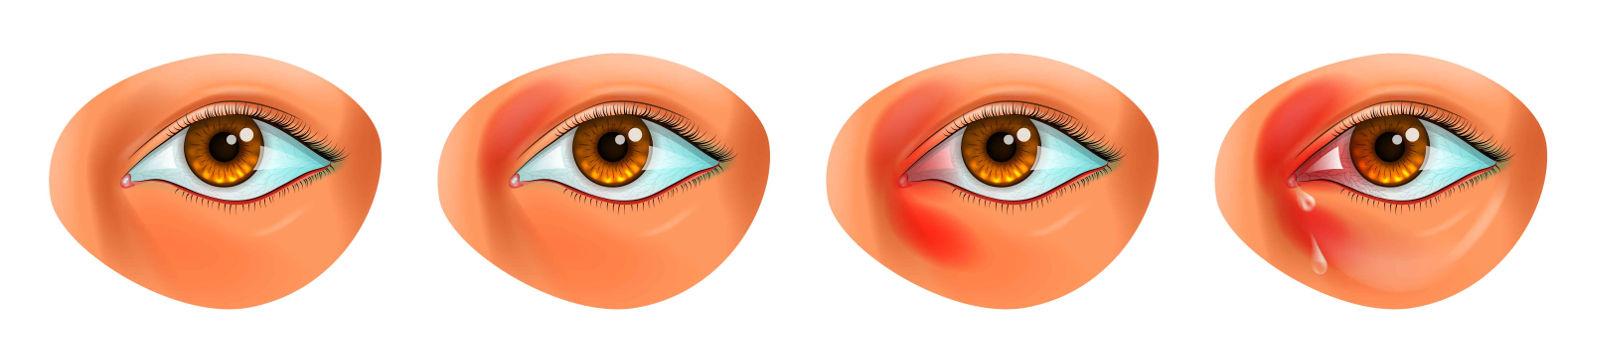 Saco tratamiento ocular de